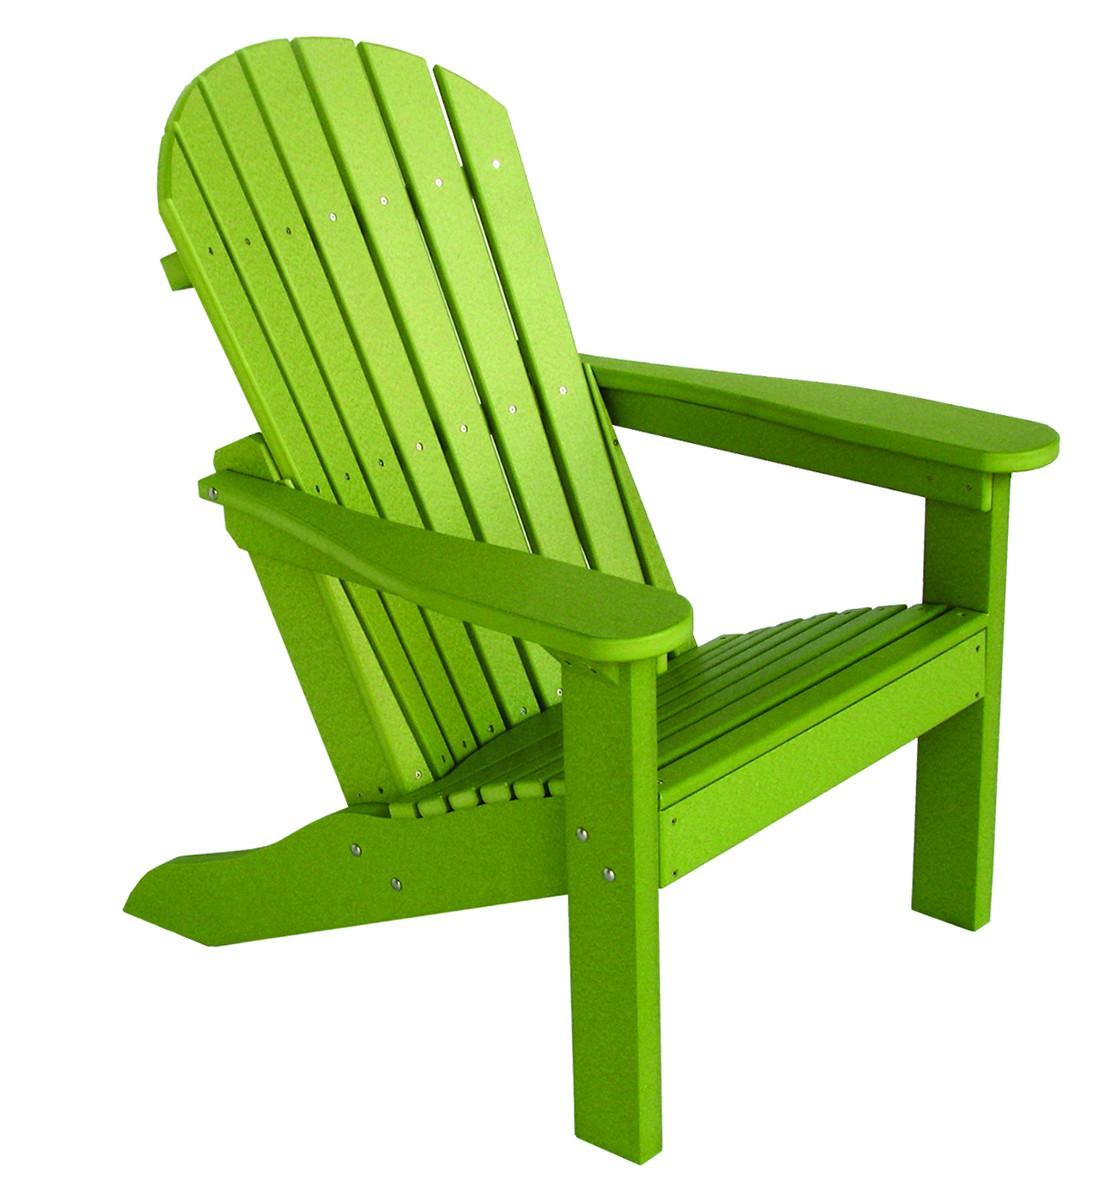 Berlin Gardens Collection Tropical Adirondack Chair